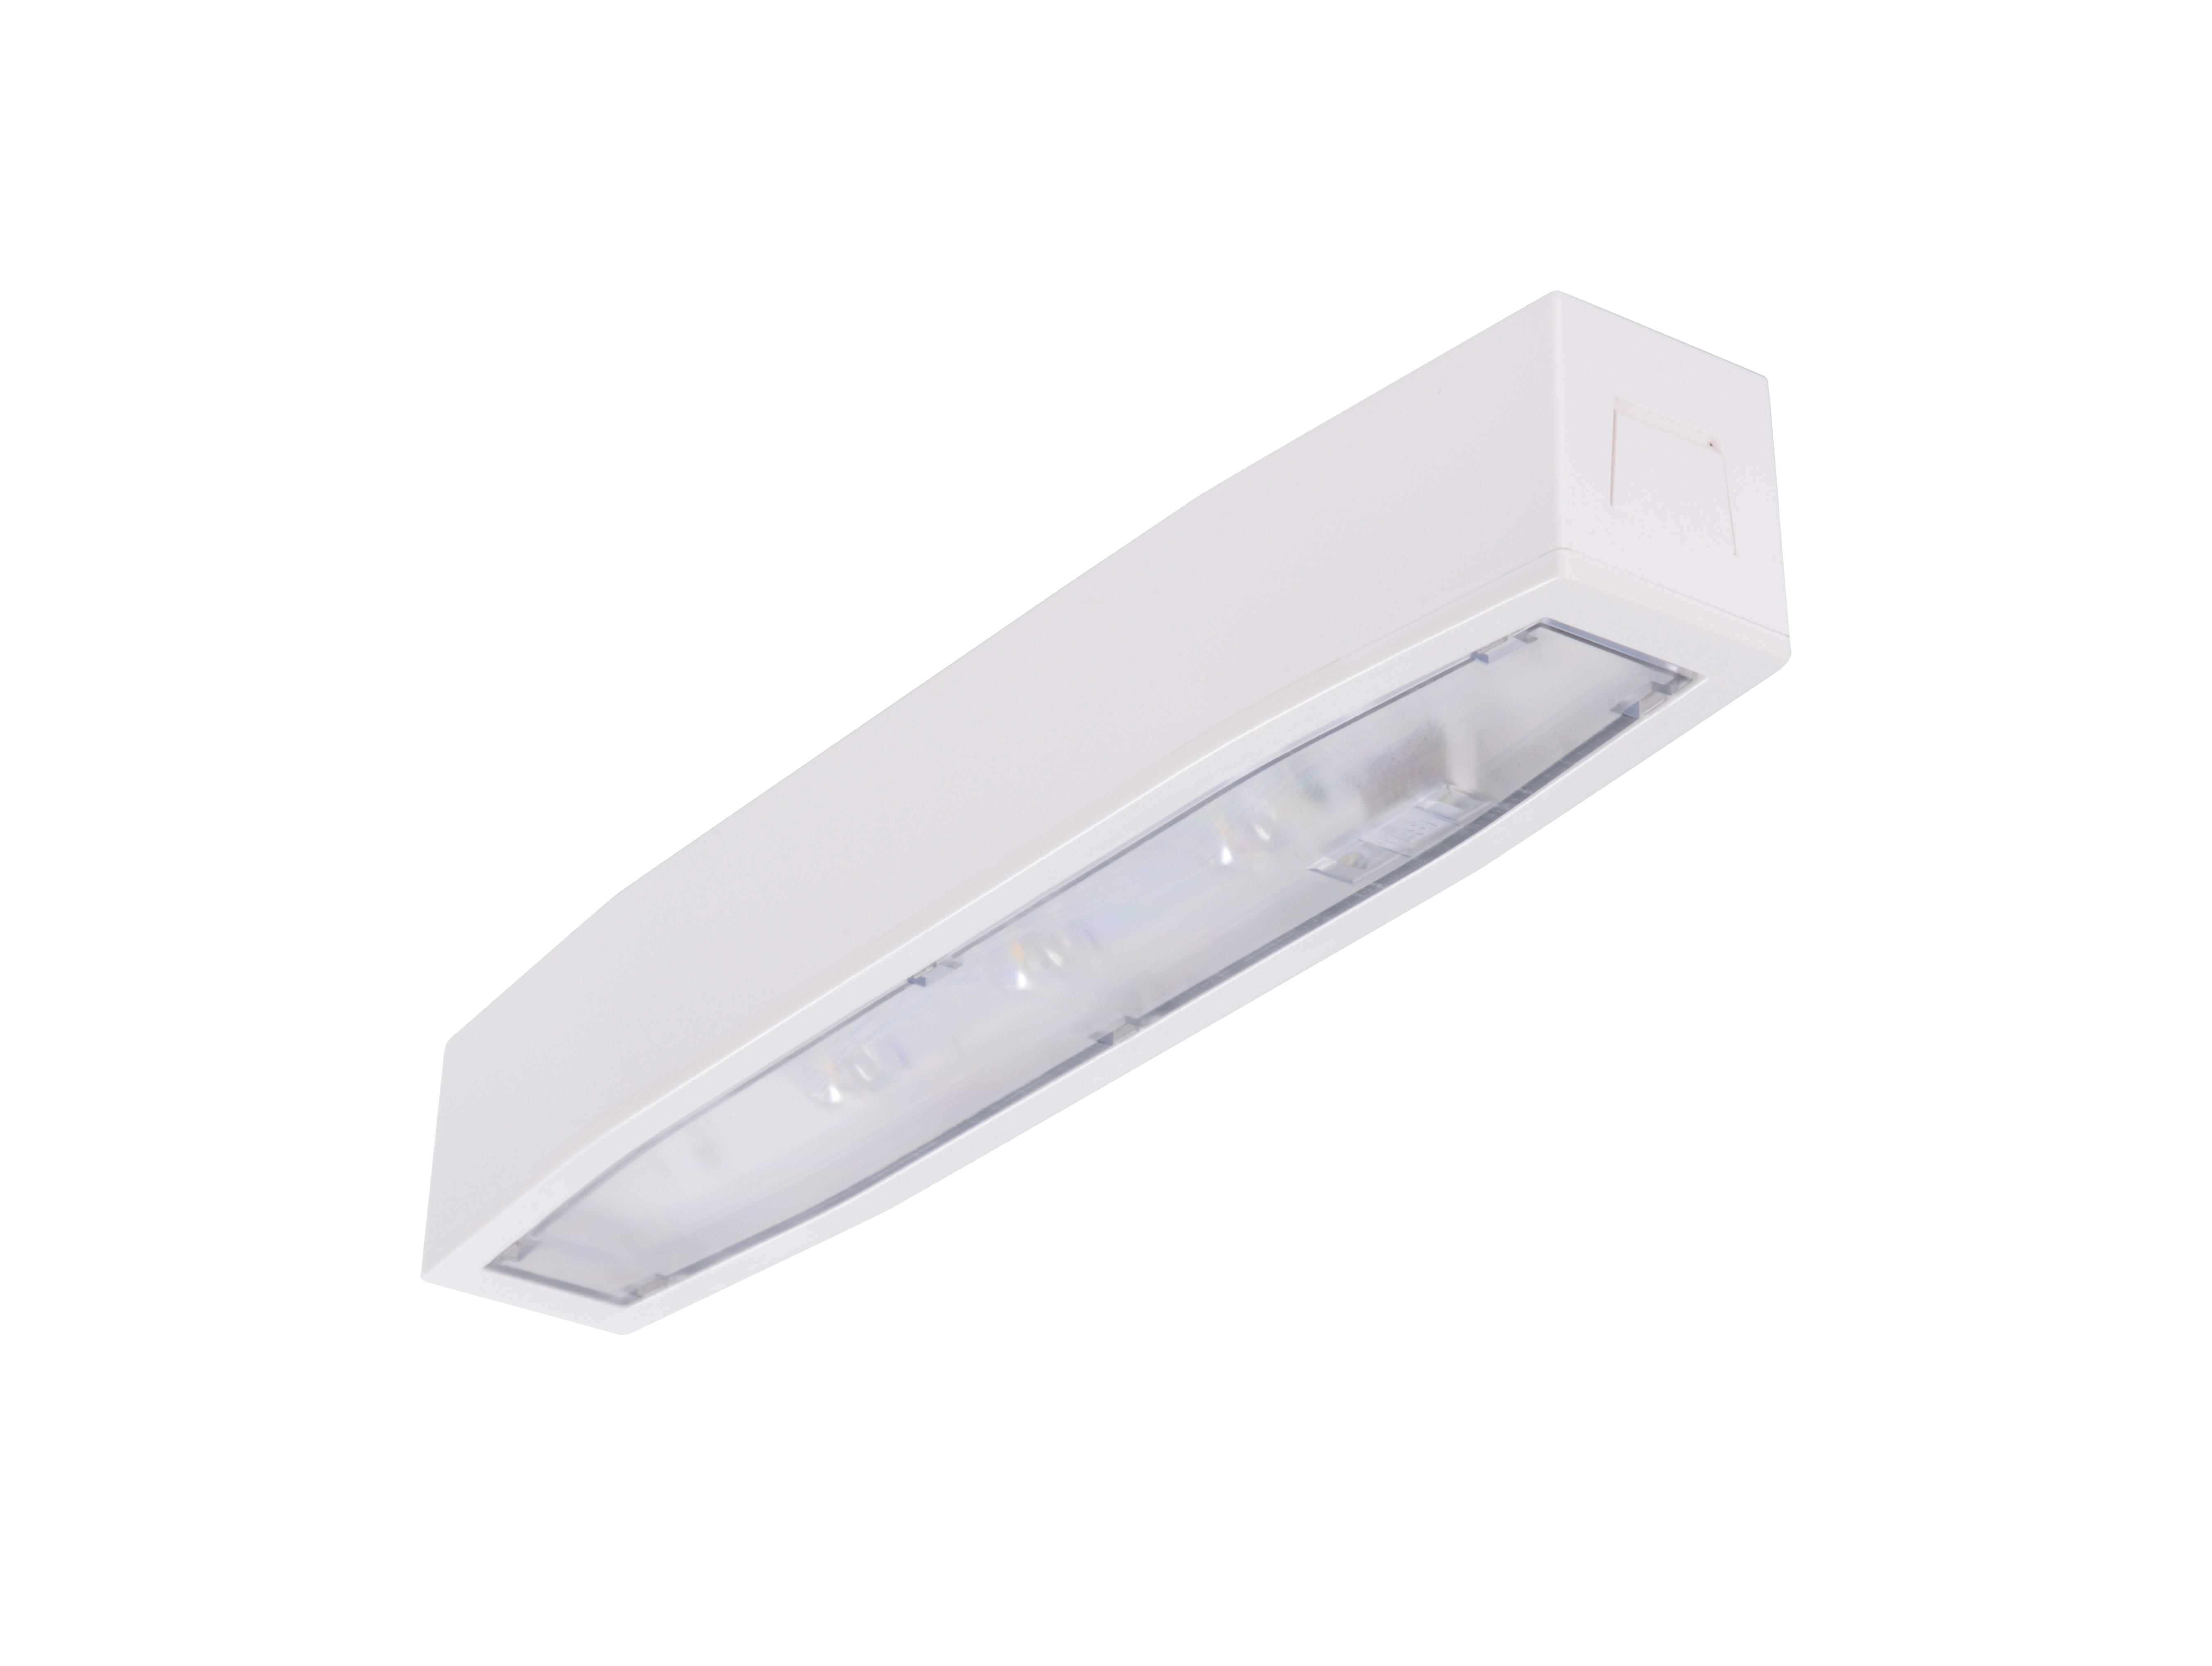 Lampa emergenta led Intelight 94552   3h mentinut test automat 0